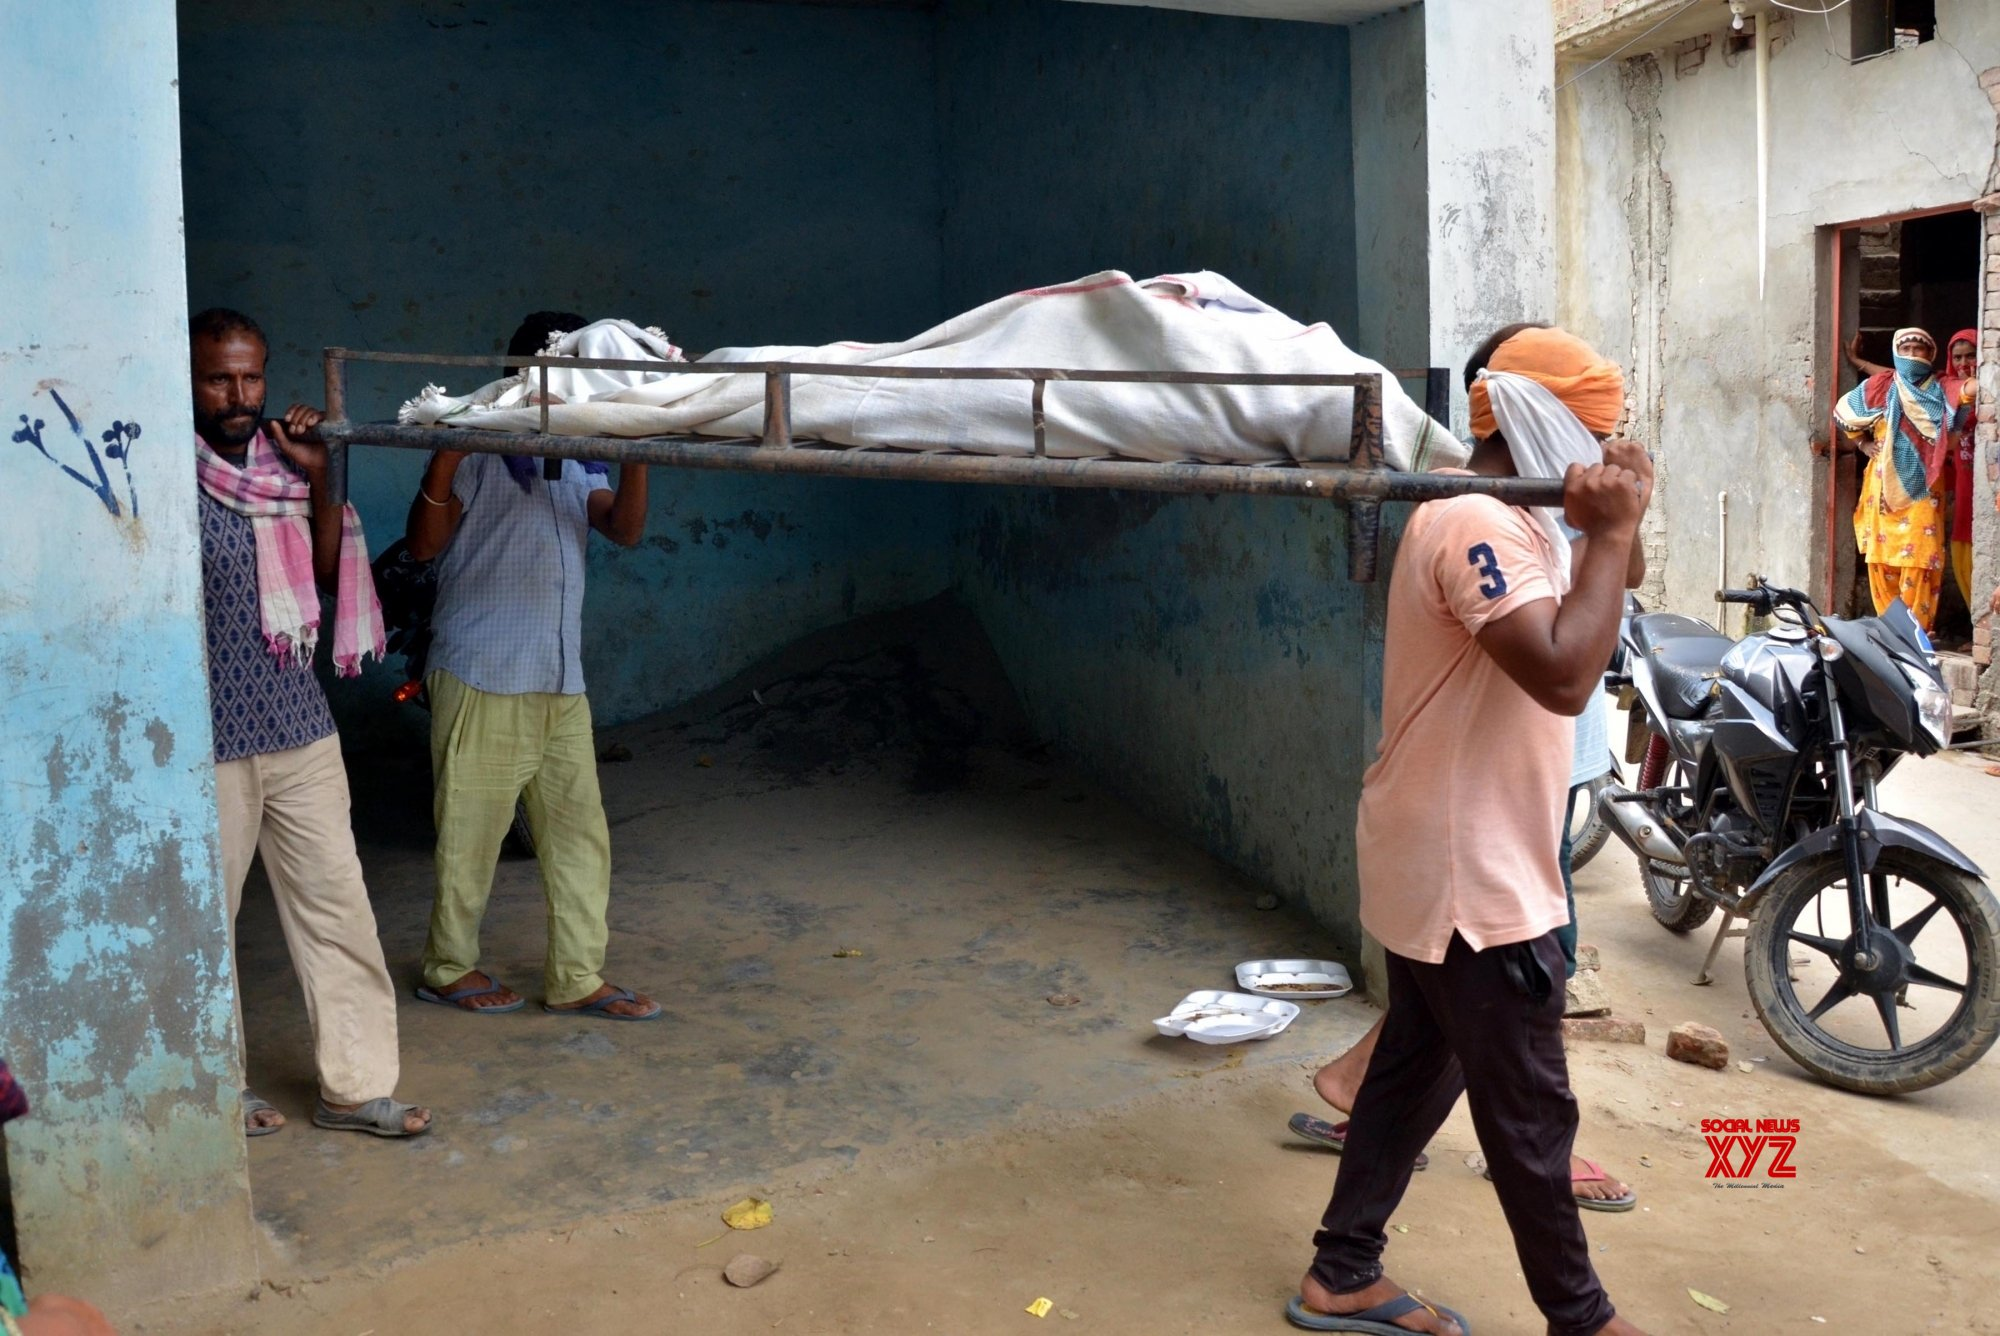 Amritsar: Spurious liquor kills 1 in Muchhal village #Gallery